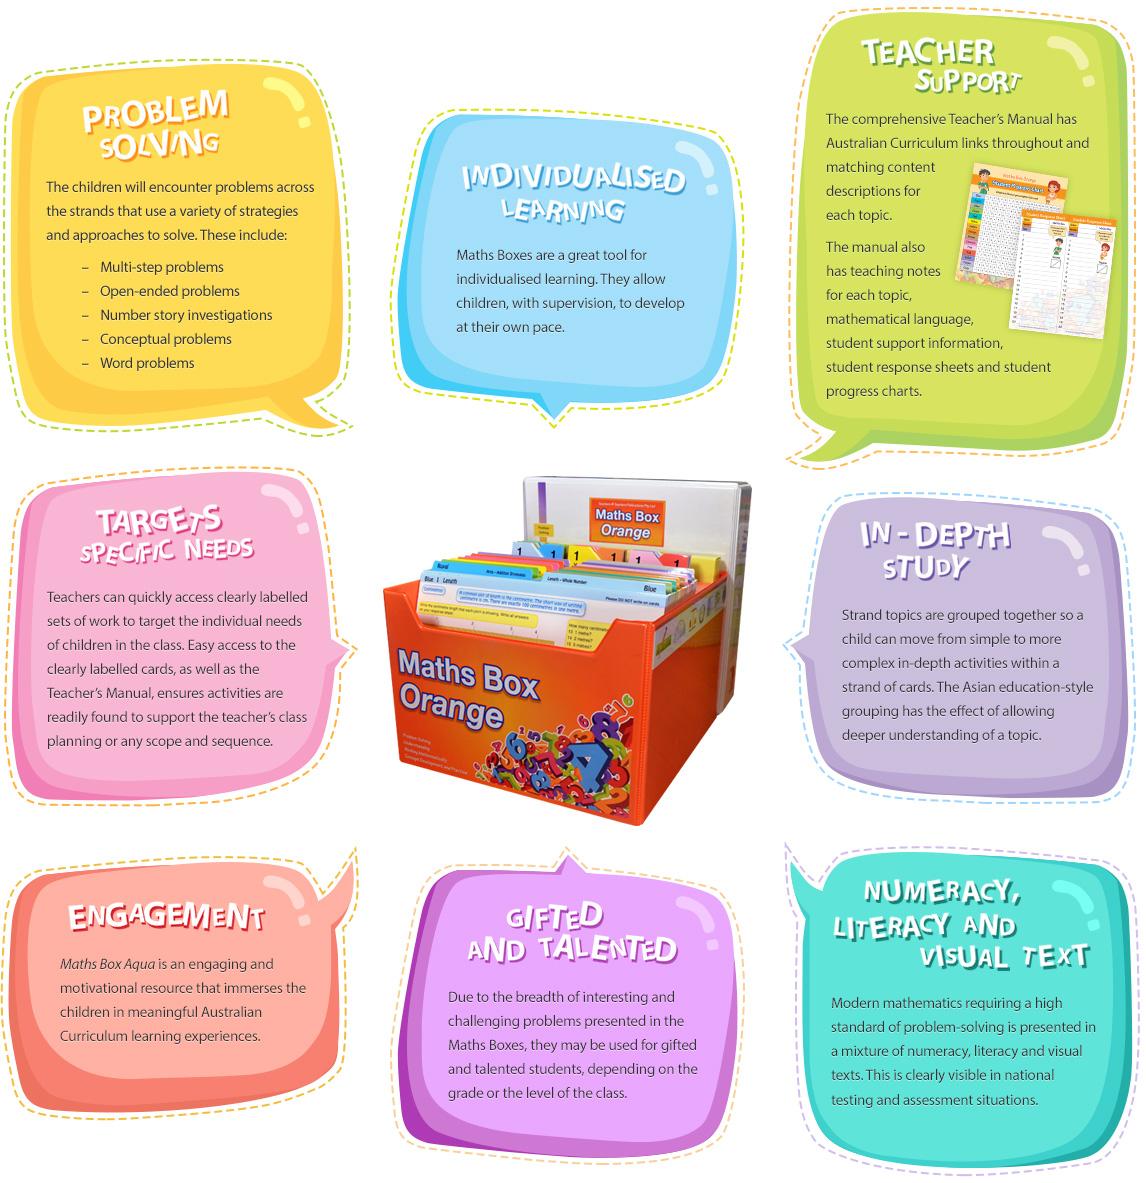 Maths Box Orange - Teachers 4 Teachers Publications Pty Ltd